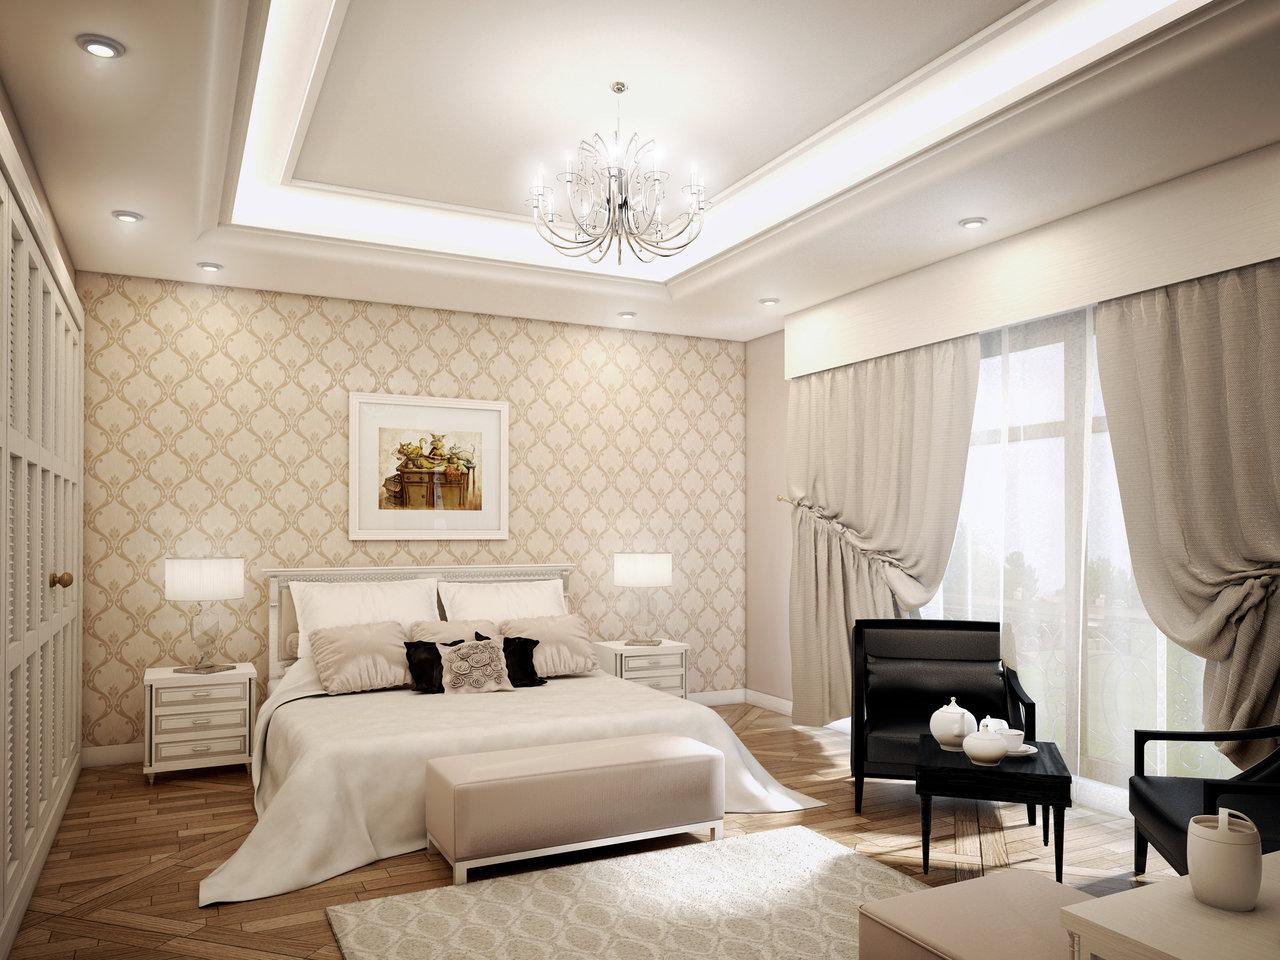 Camere Da Letto Alto Design : صور ديكورات غرف نوم جديدة شركة بدء الانجاز للرخام